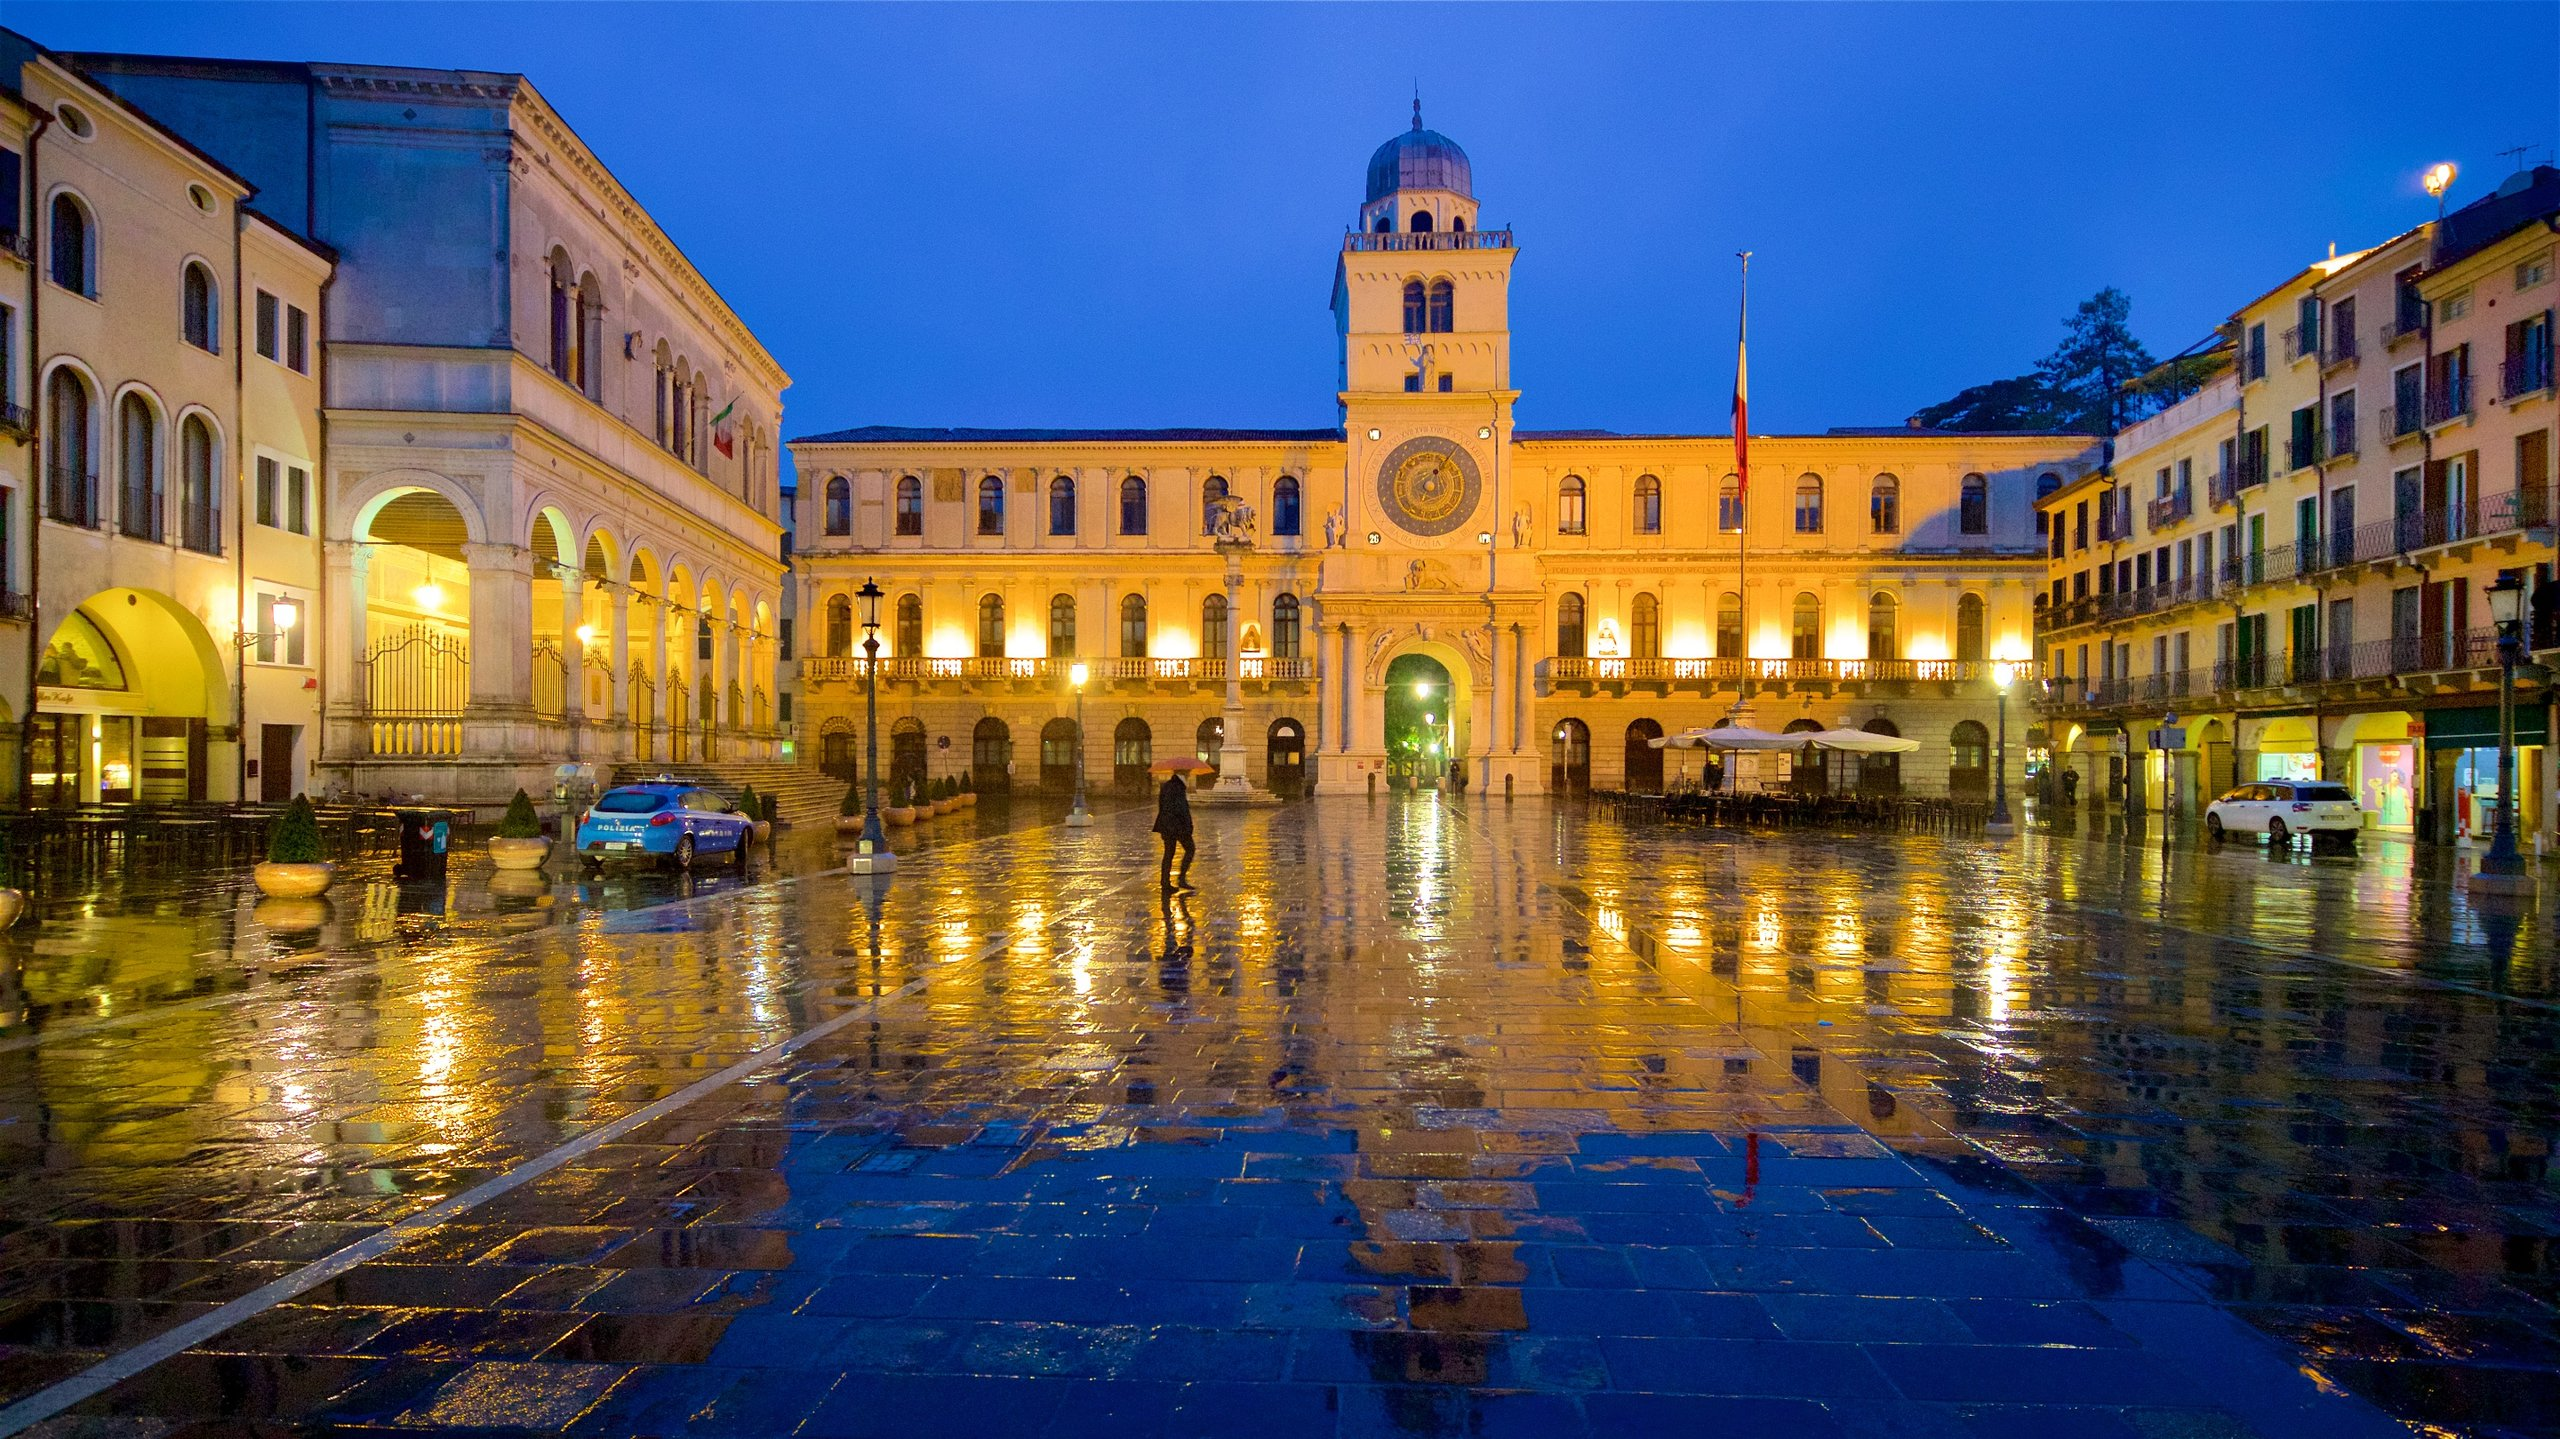 Padua Provinz, Veneto, Italien